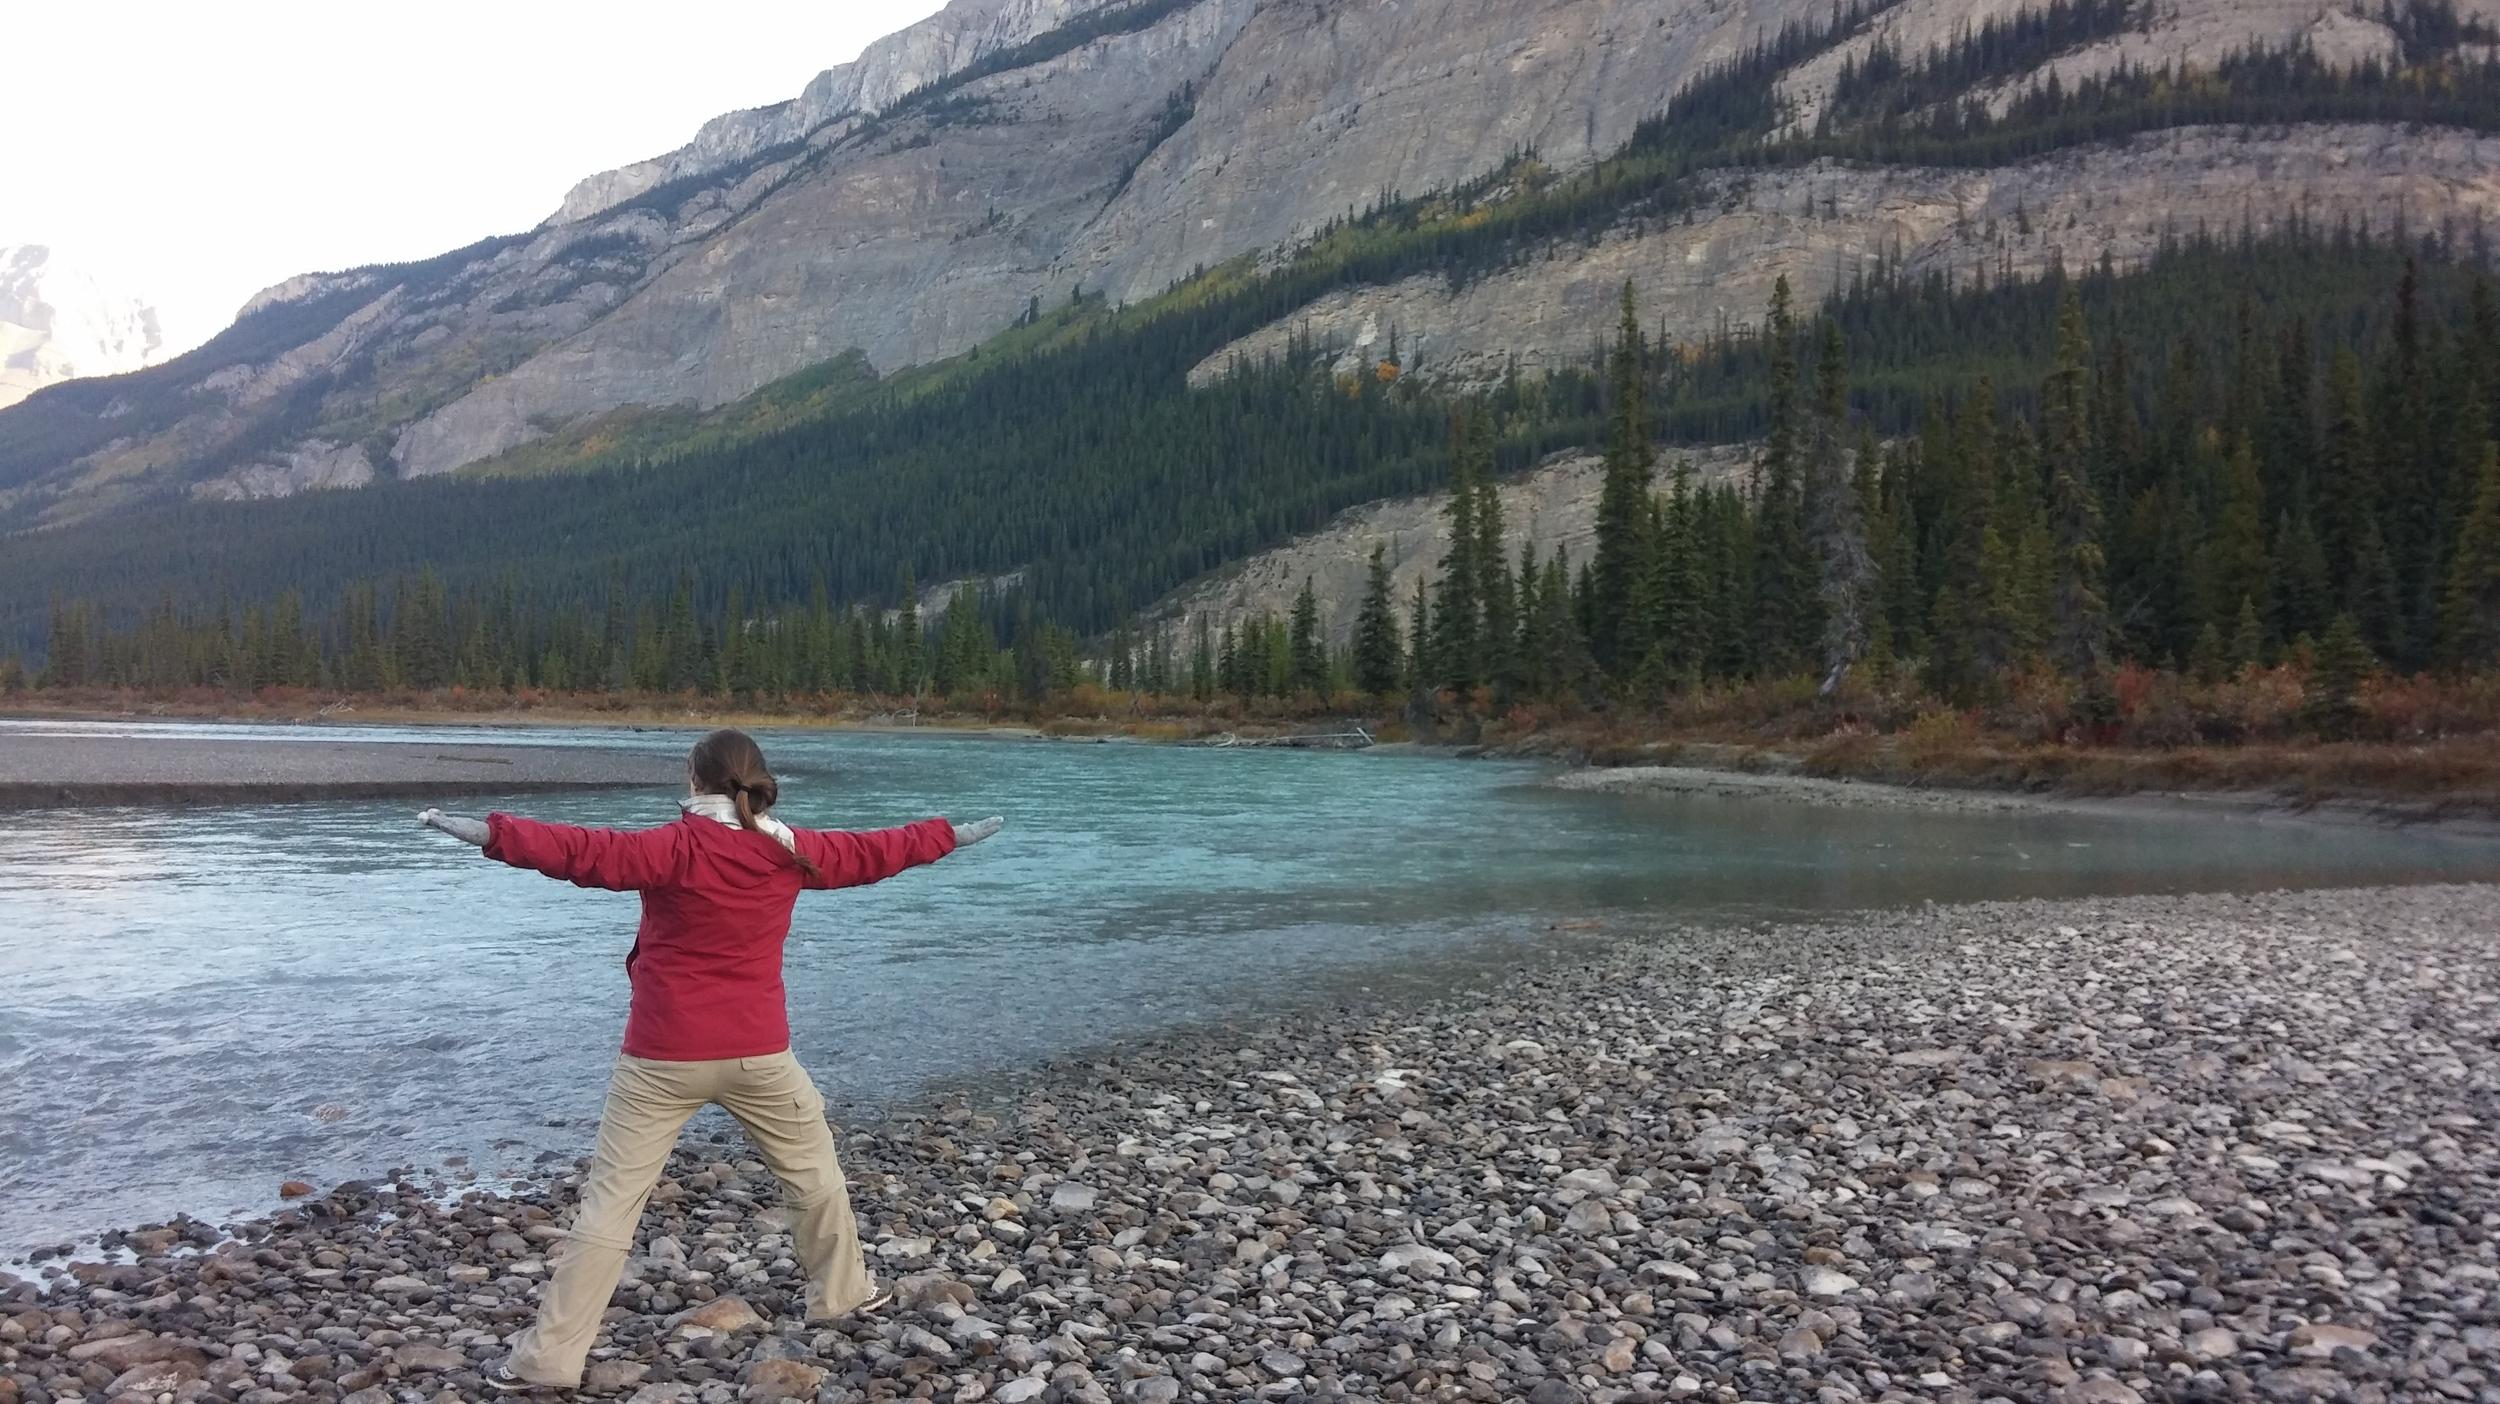 Morning yoga along a river in Banff National Park, Alberta.